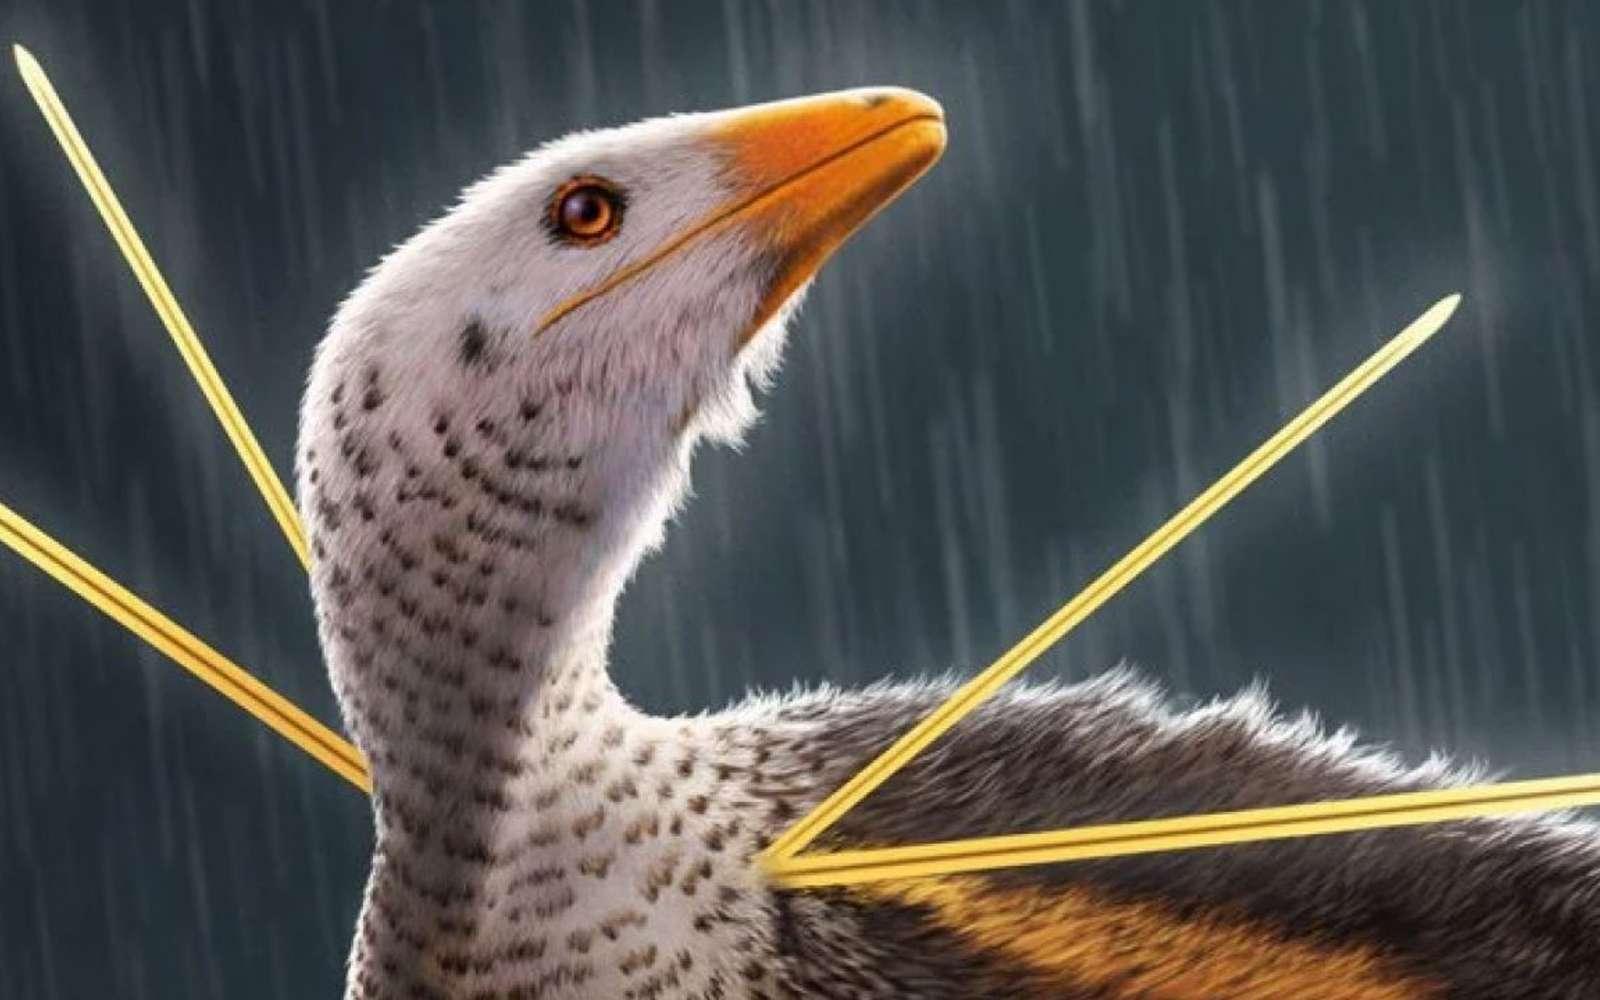 Ubirajara jubatus, un dinosaure à fourrure du Gondwana. © Bob Nicholls, Paleocreations.com 2020